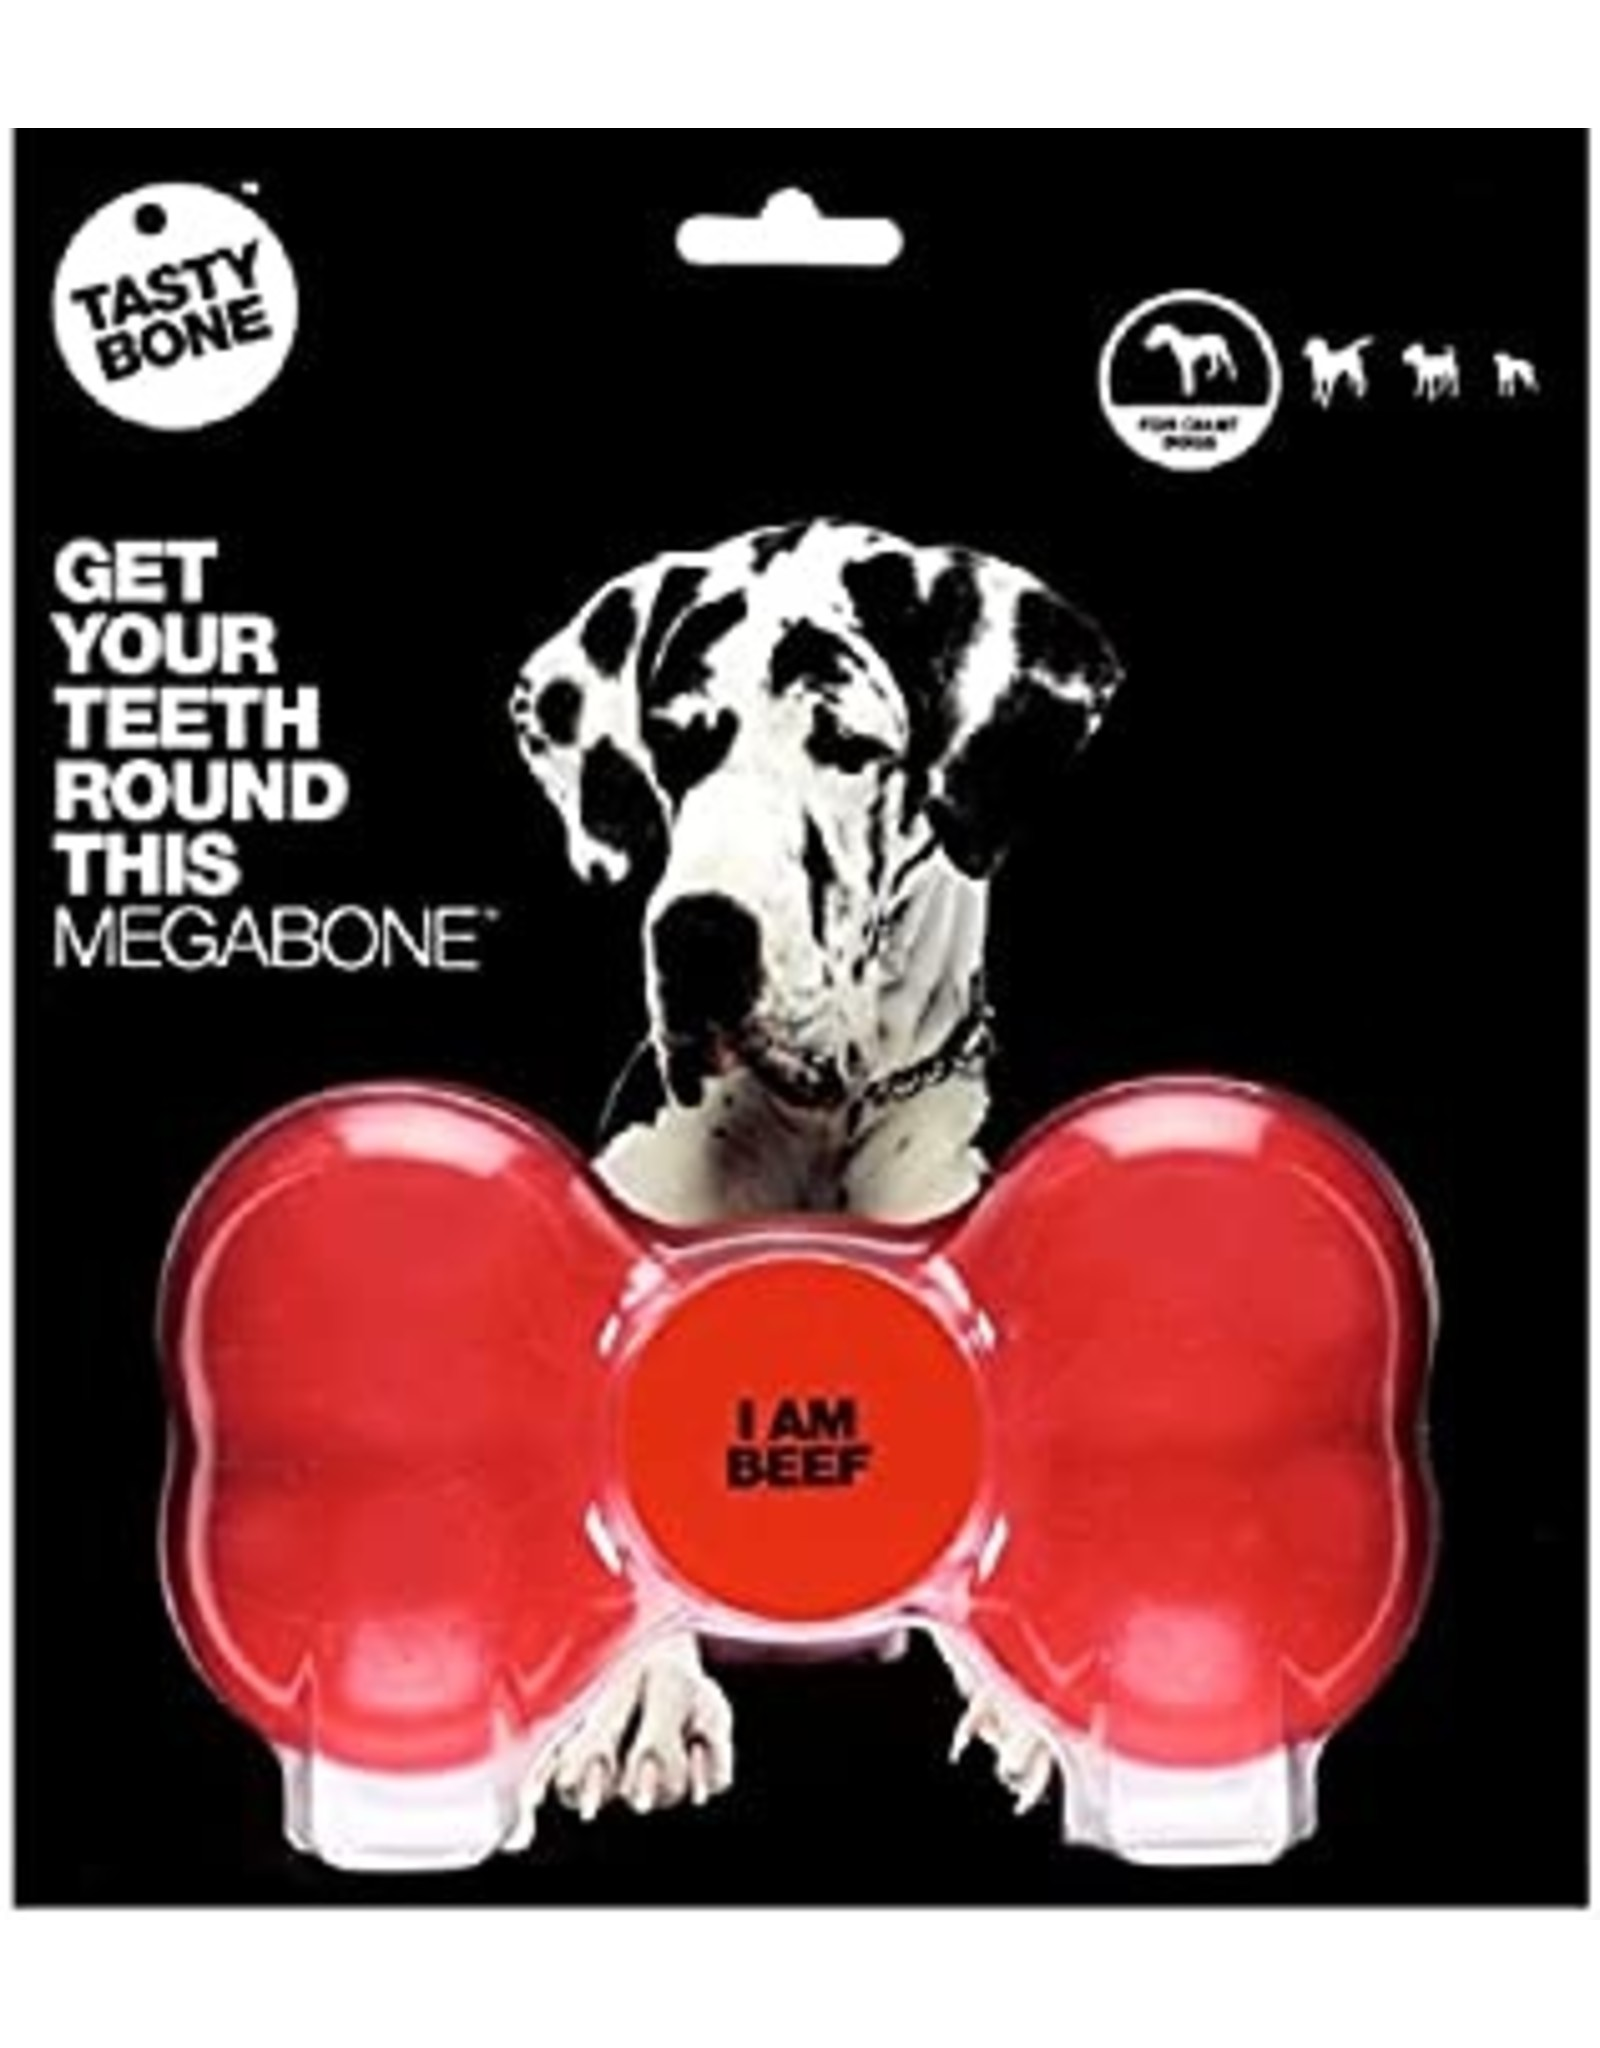 Tastybone Mega TastyBone Beef